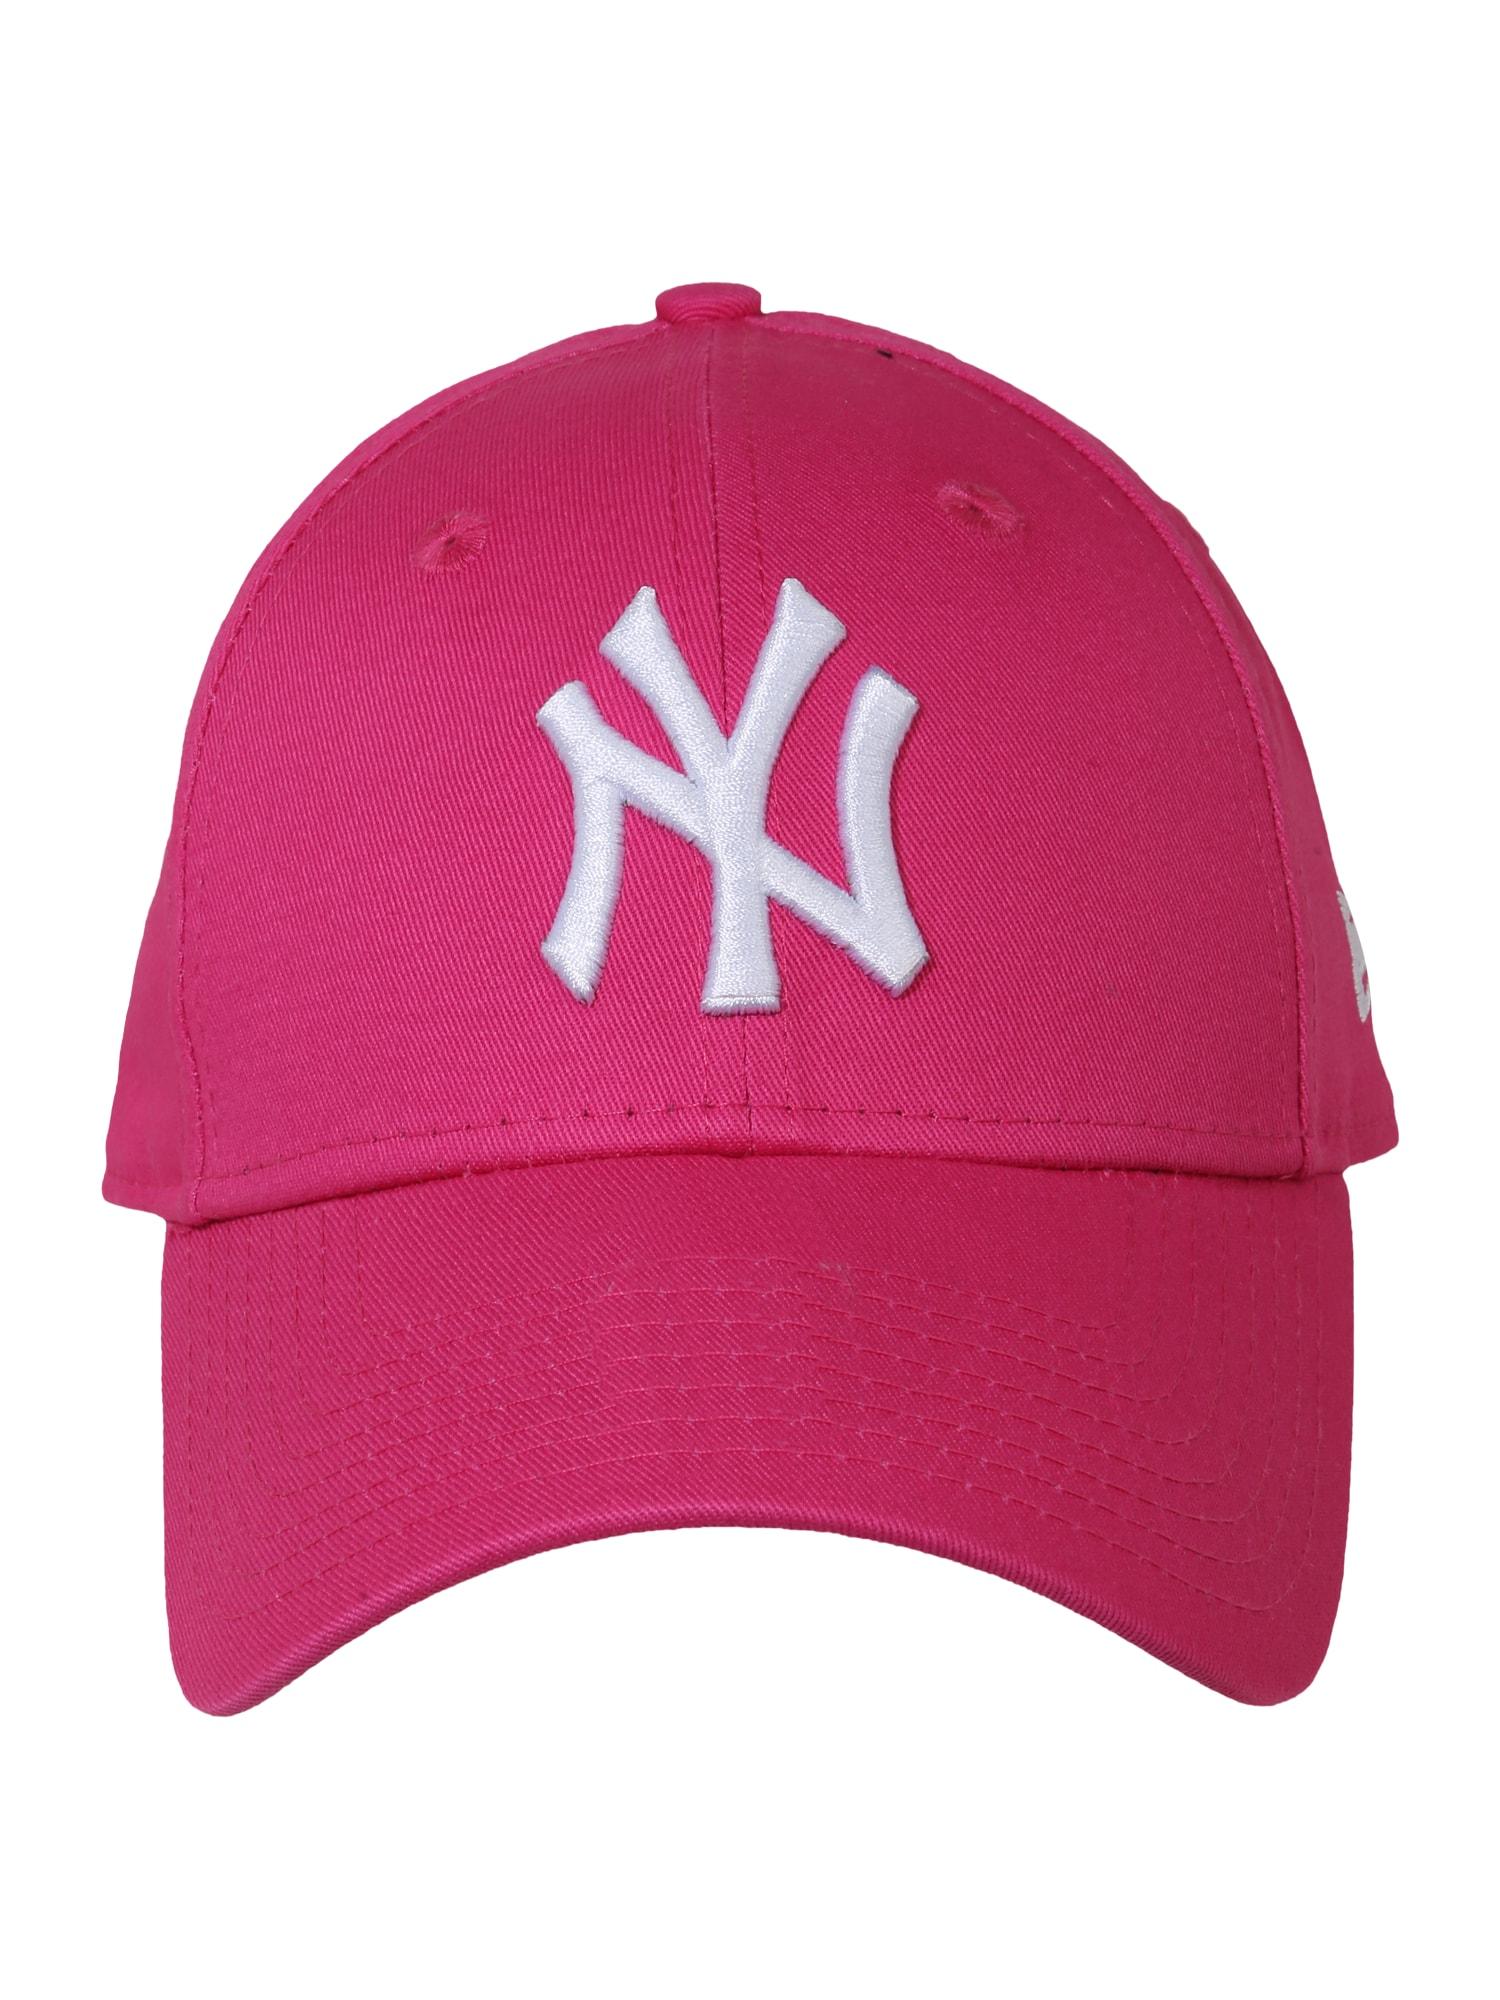 Čepice 940 pink bílá NEW ERA